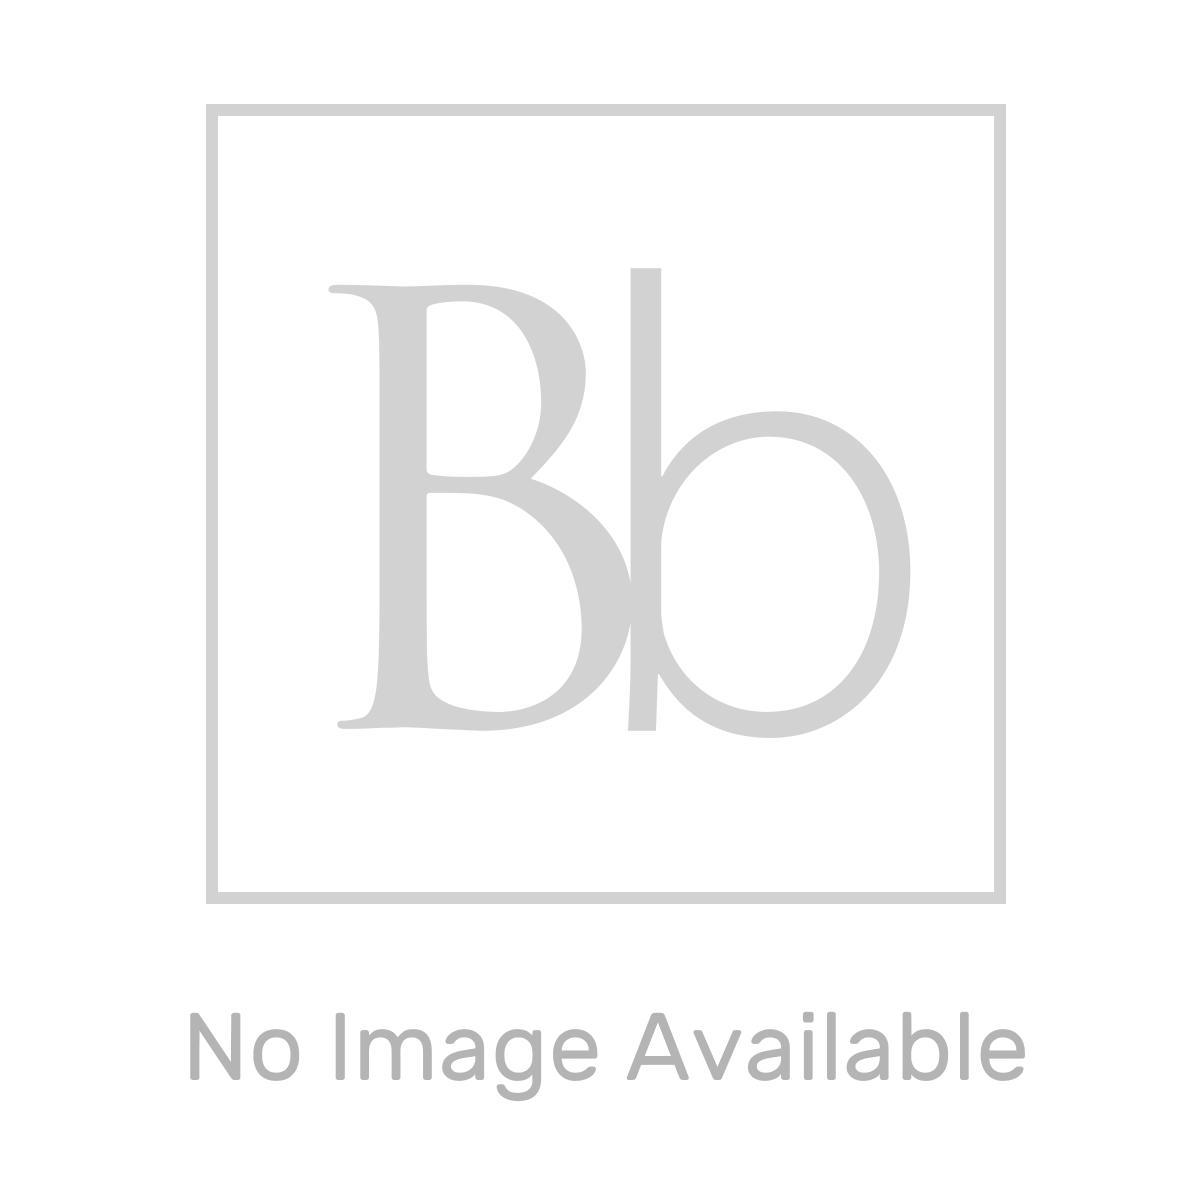 Aquadart White Slate Shower Tray 1700 x 700